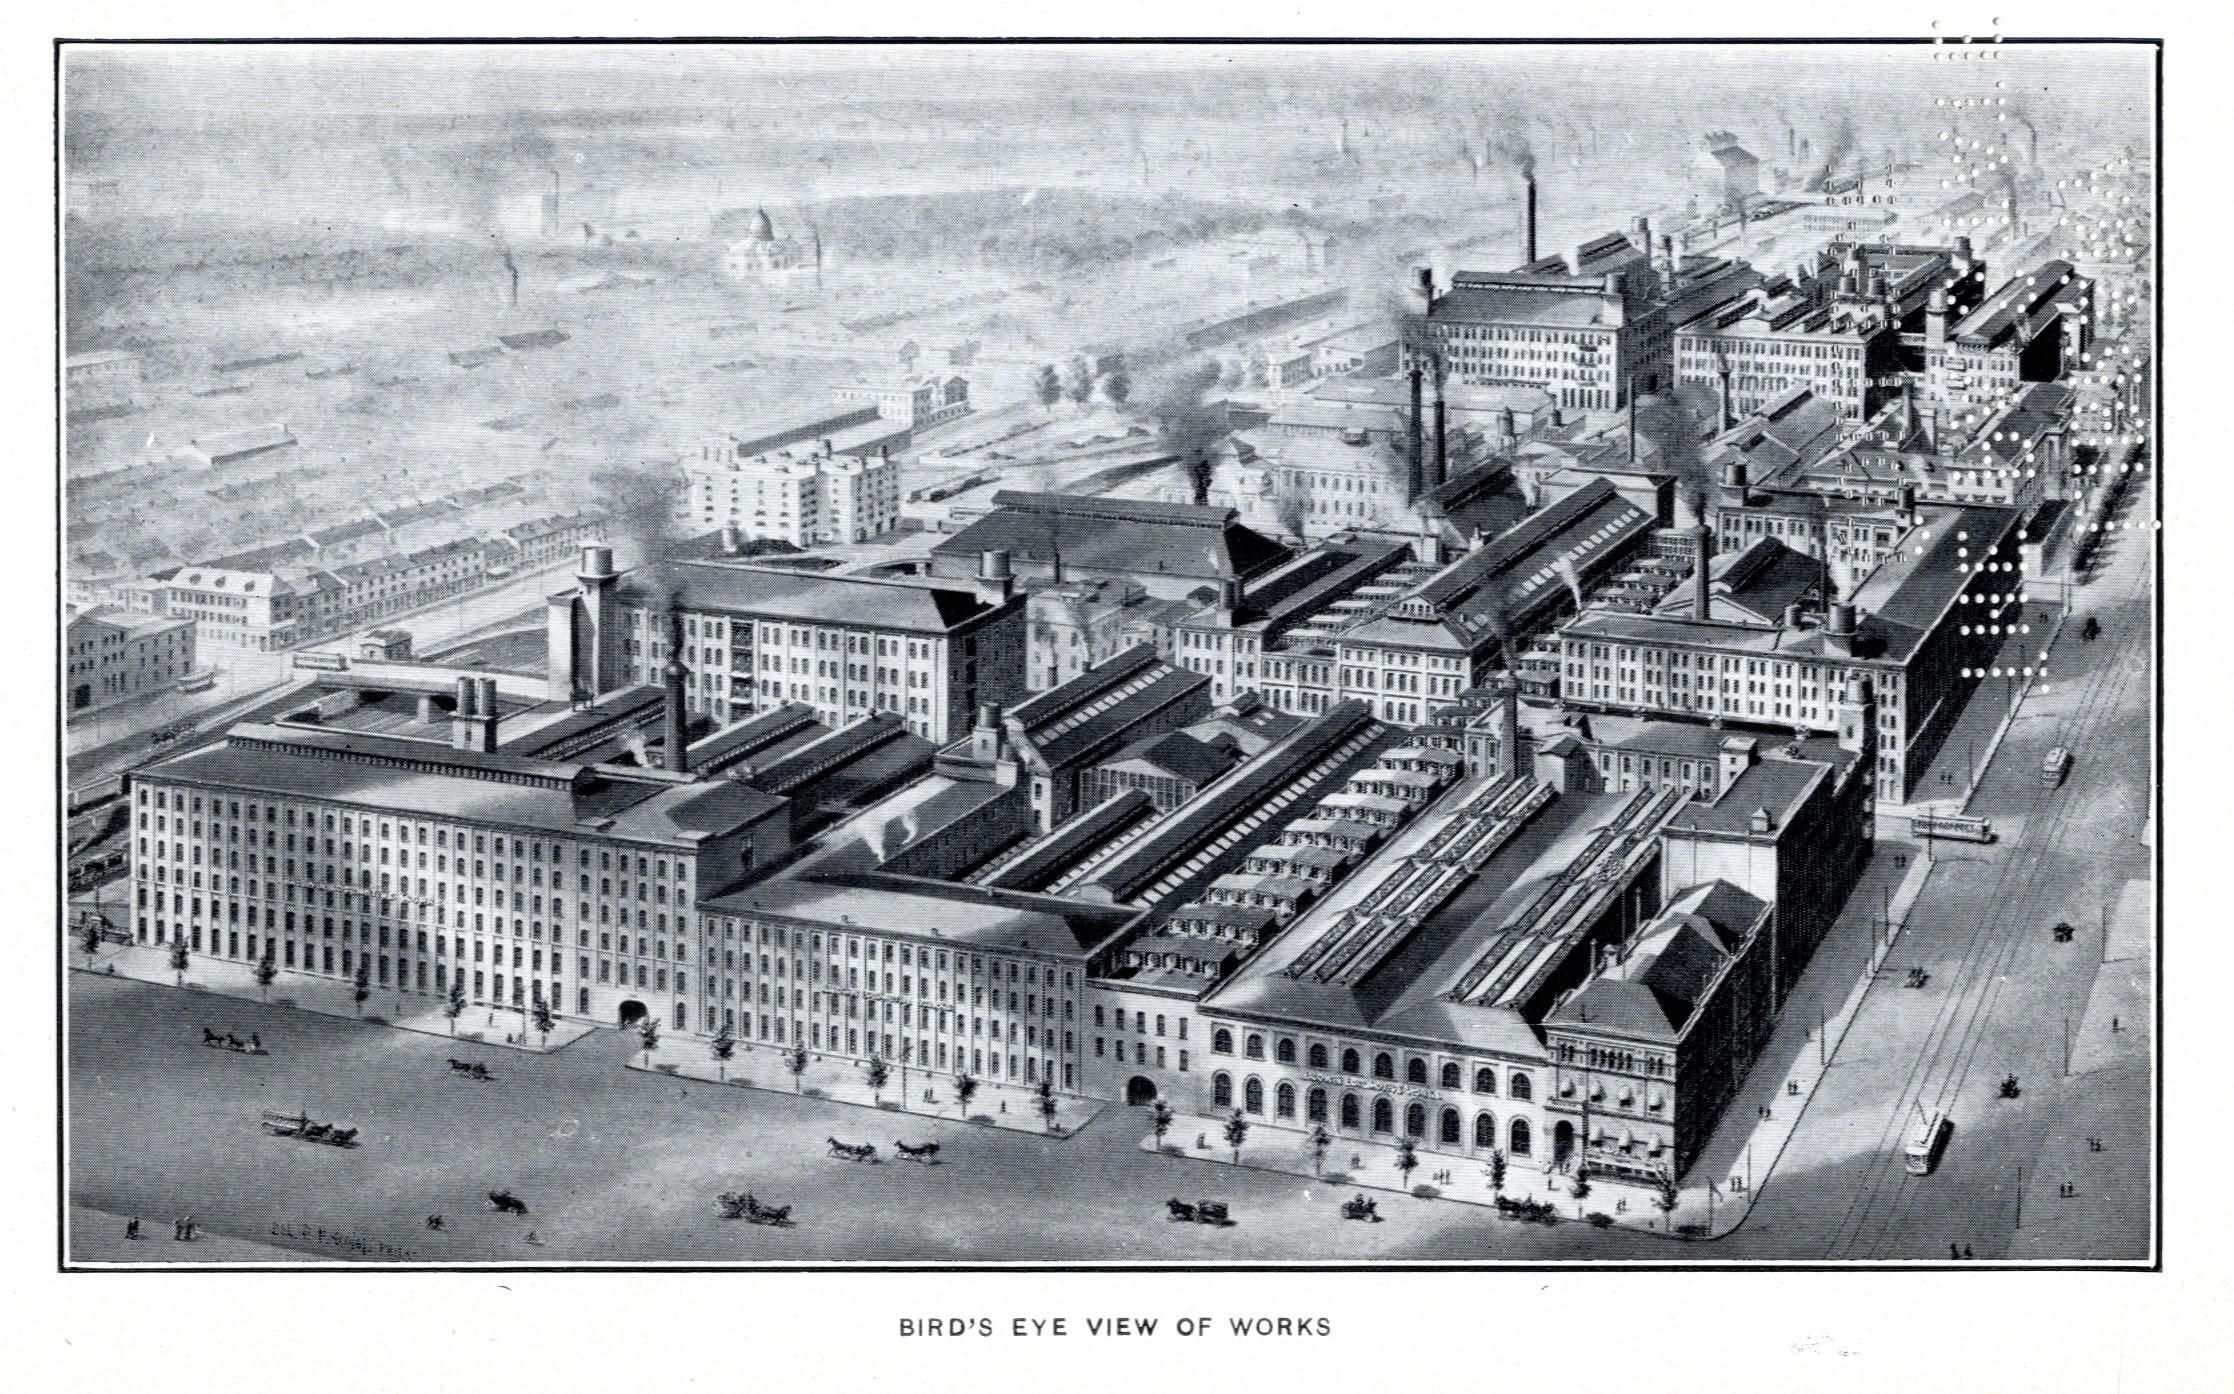 Transportation Company - Baldwin Locomotive Works - Railroad Equipment